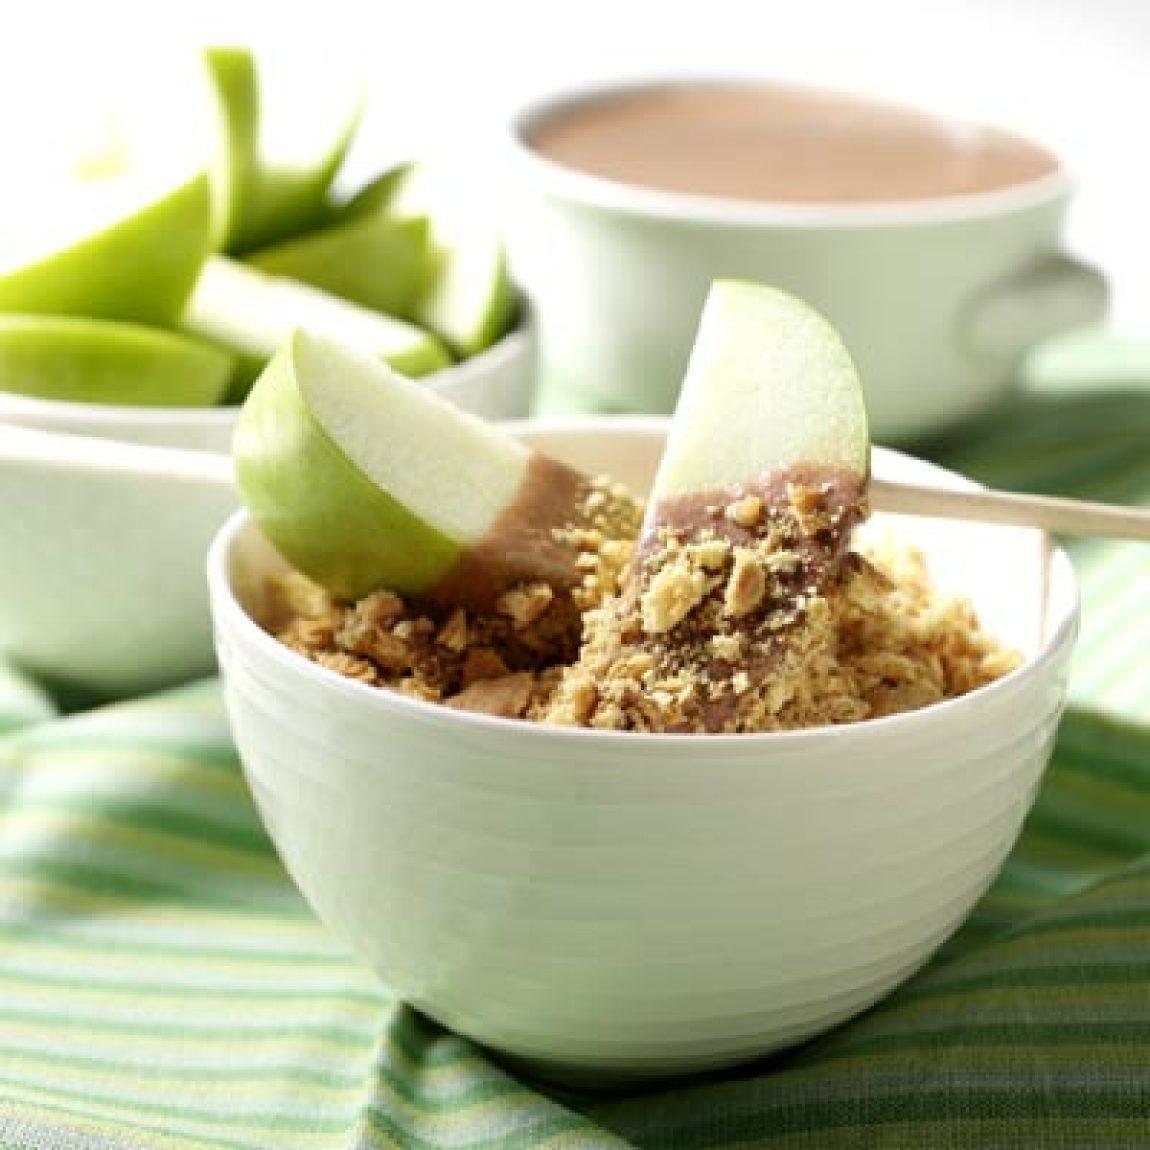 Chocolate-Peanut Butter S'mores Fondue Recipe | Just A Pinch Recipes